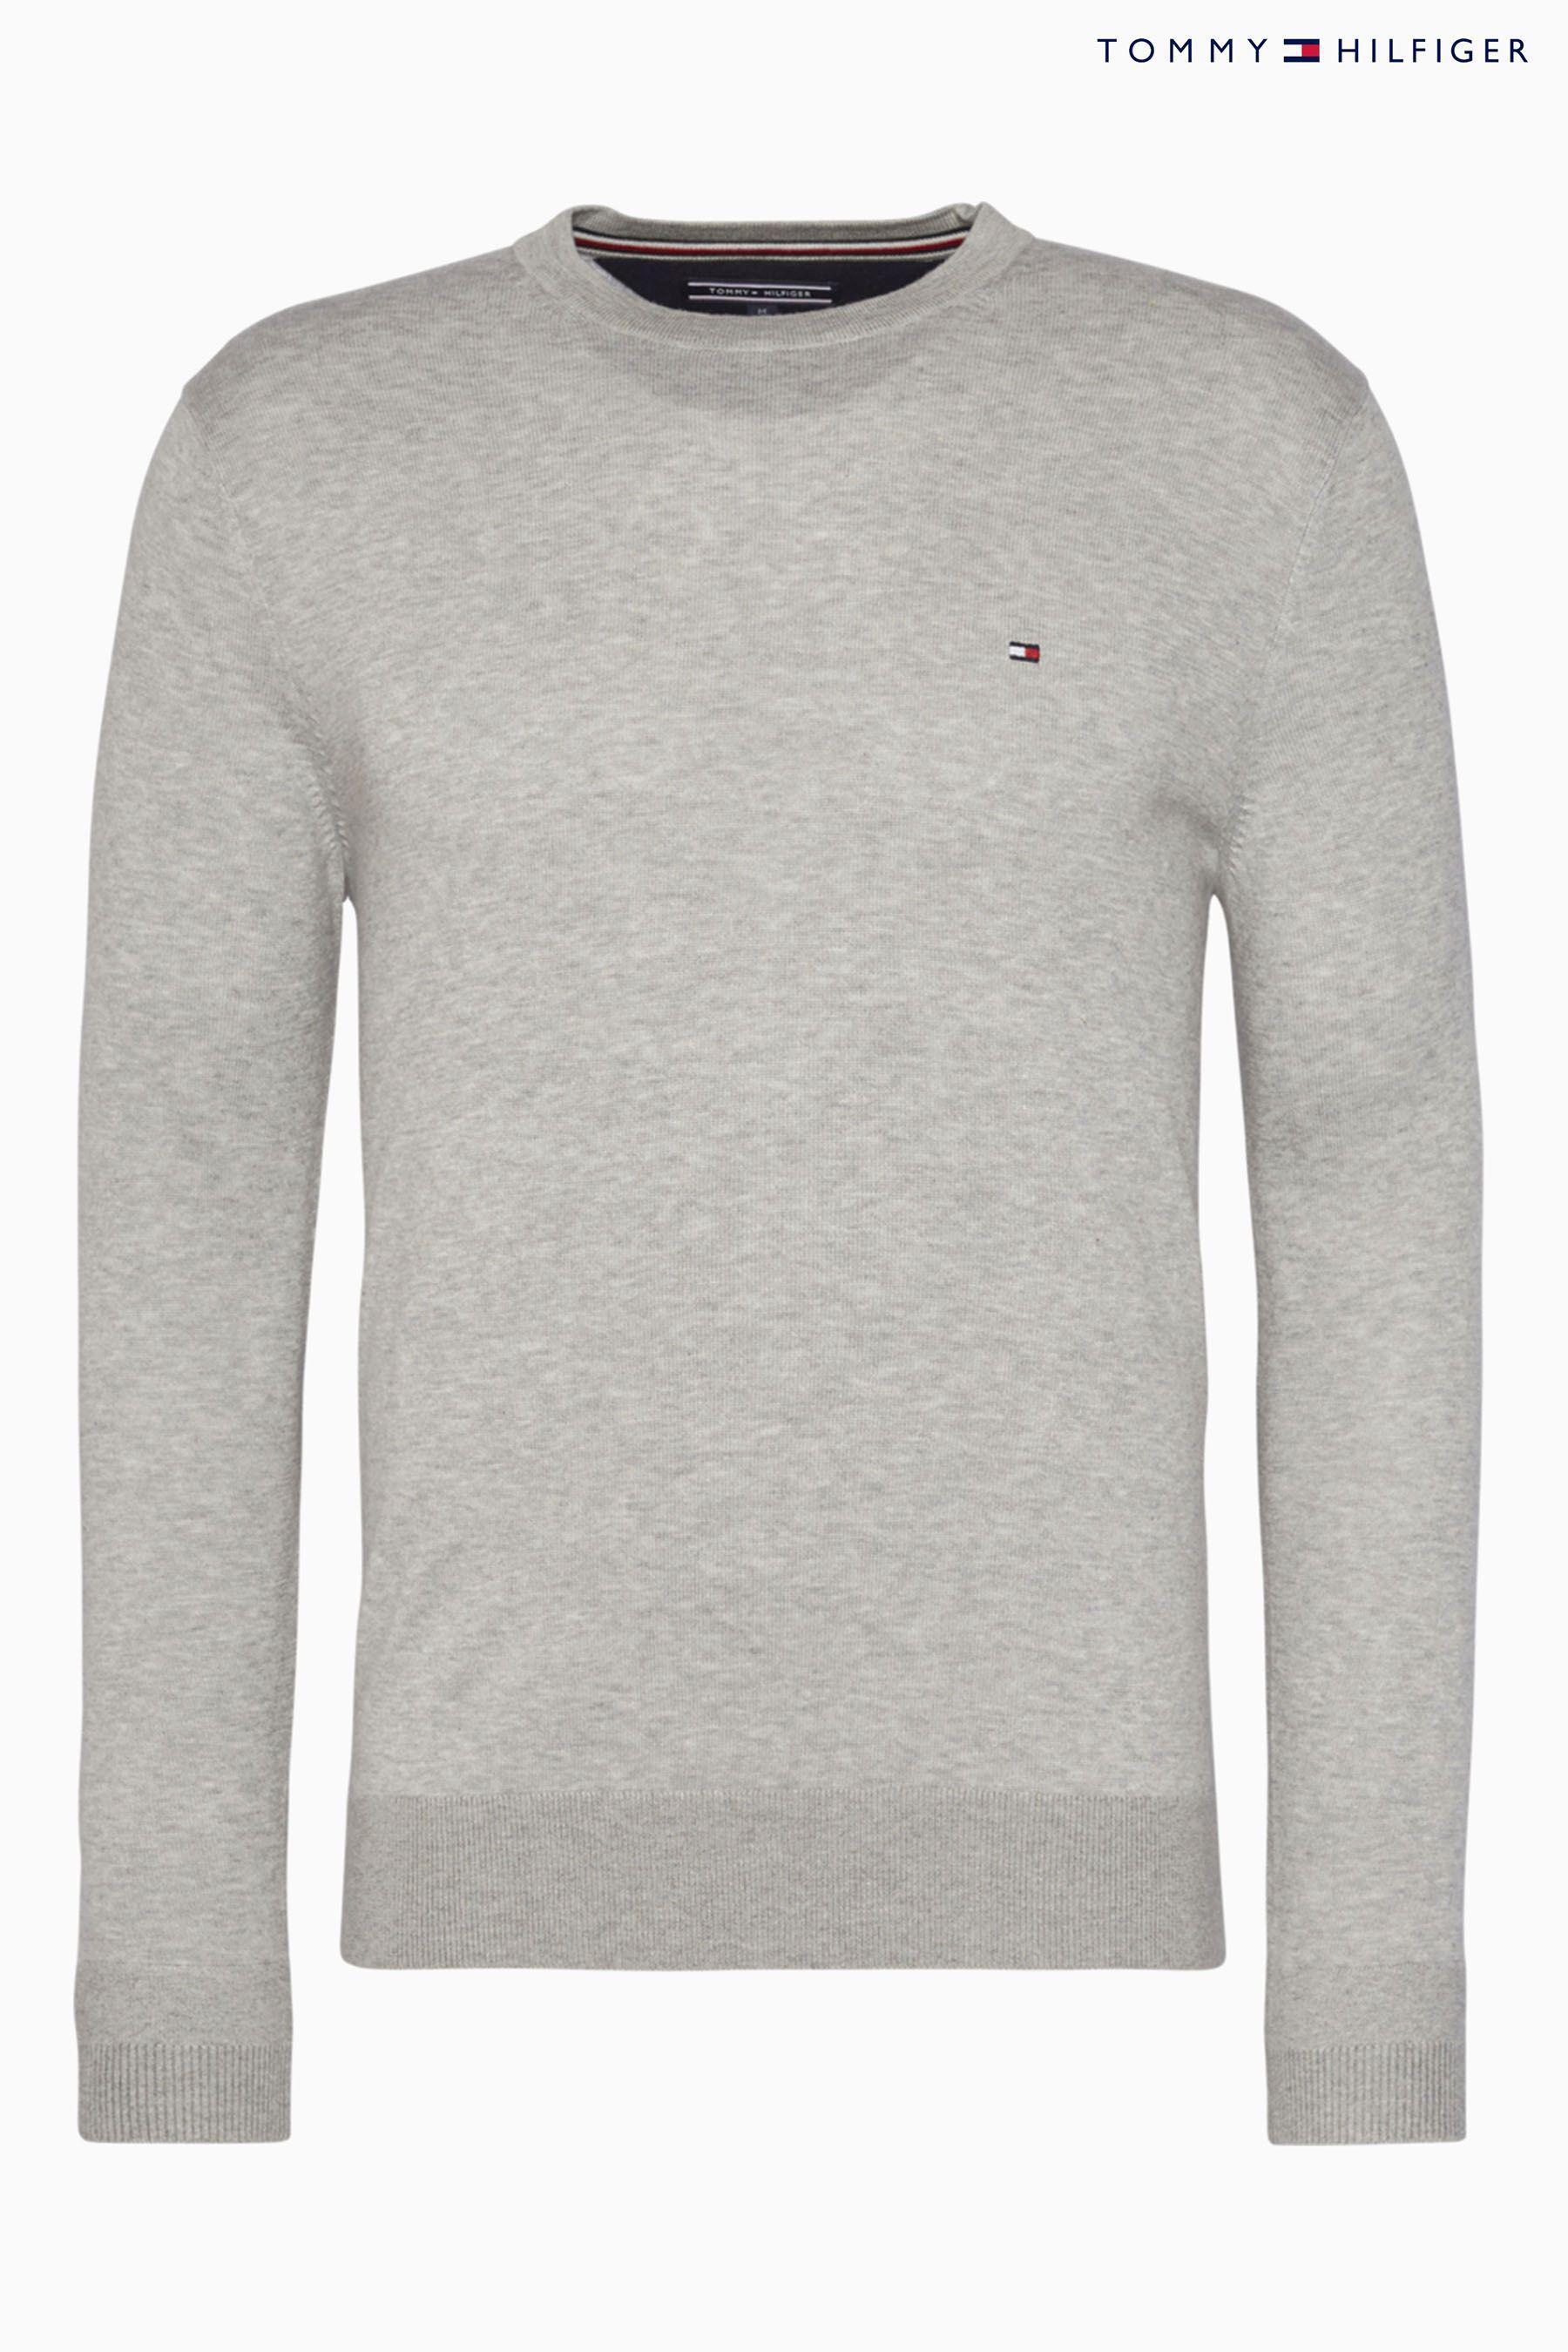 1f4cebeb0 Mens Tommy Hilfiger Core Cotton Silk Sweater - Grey in 2019 ...